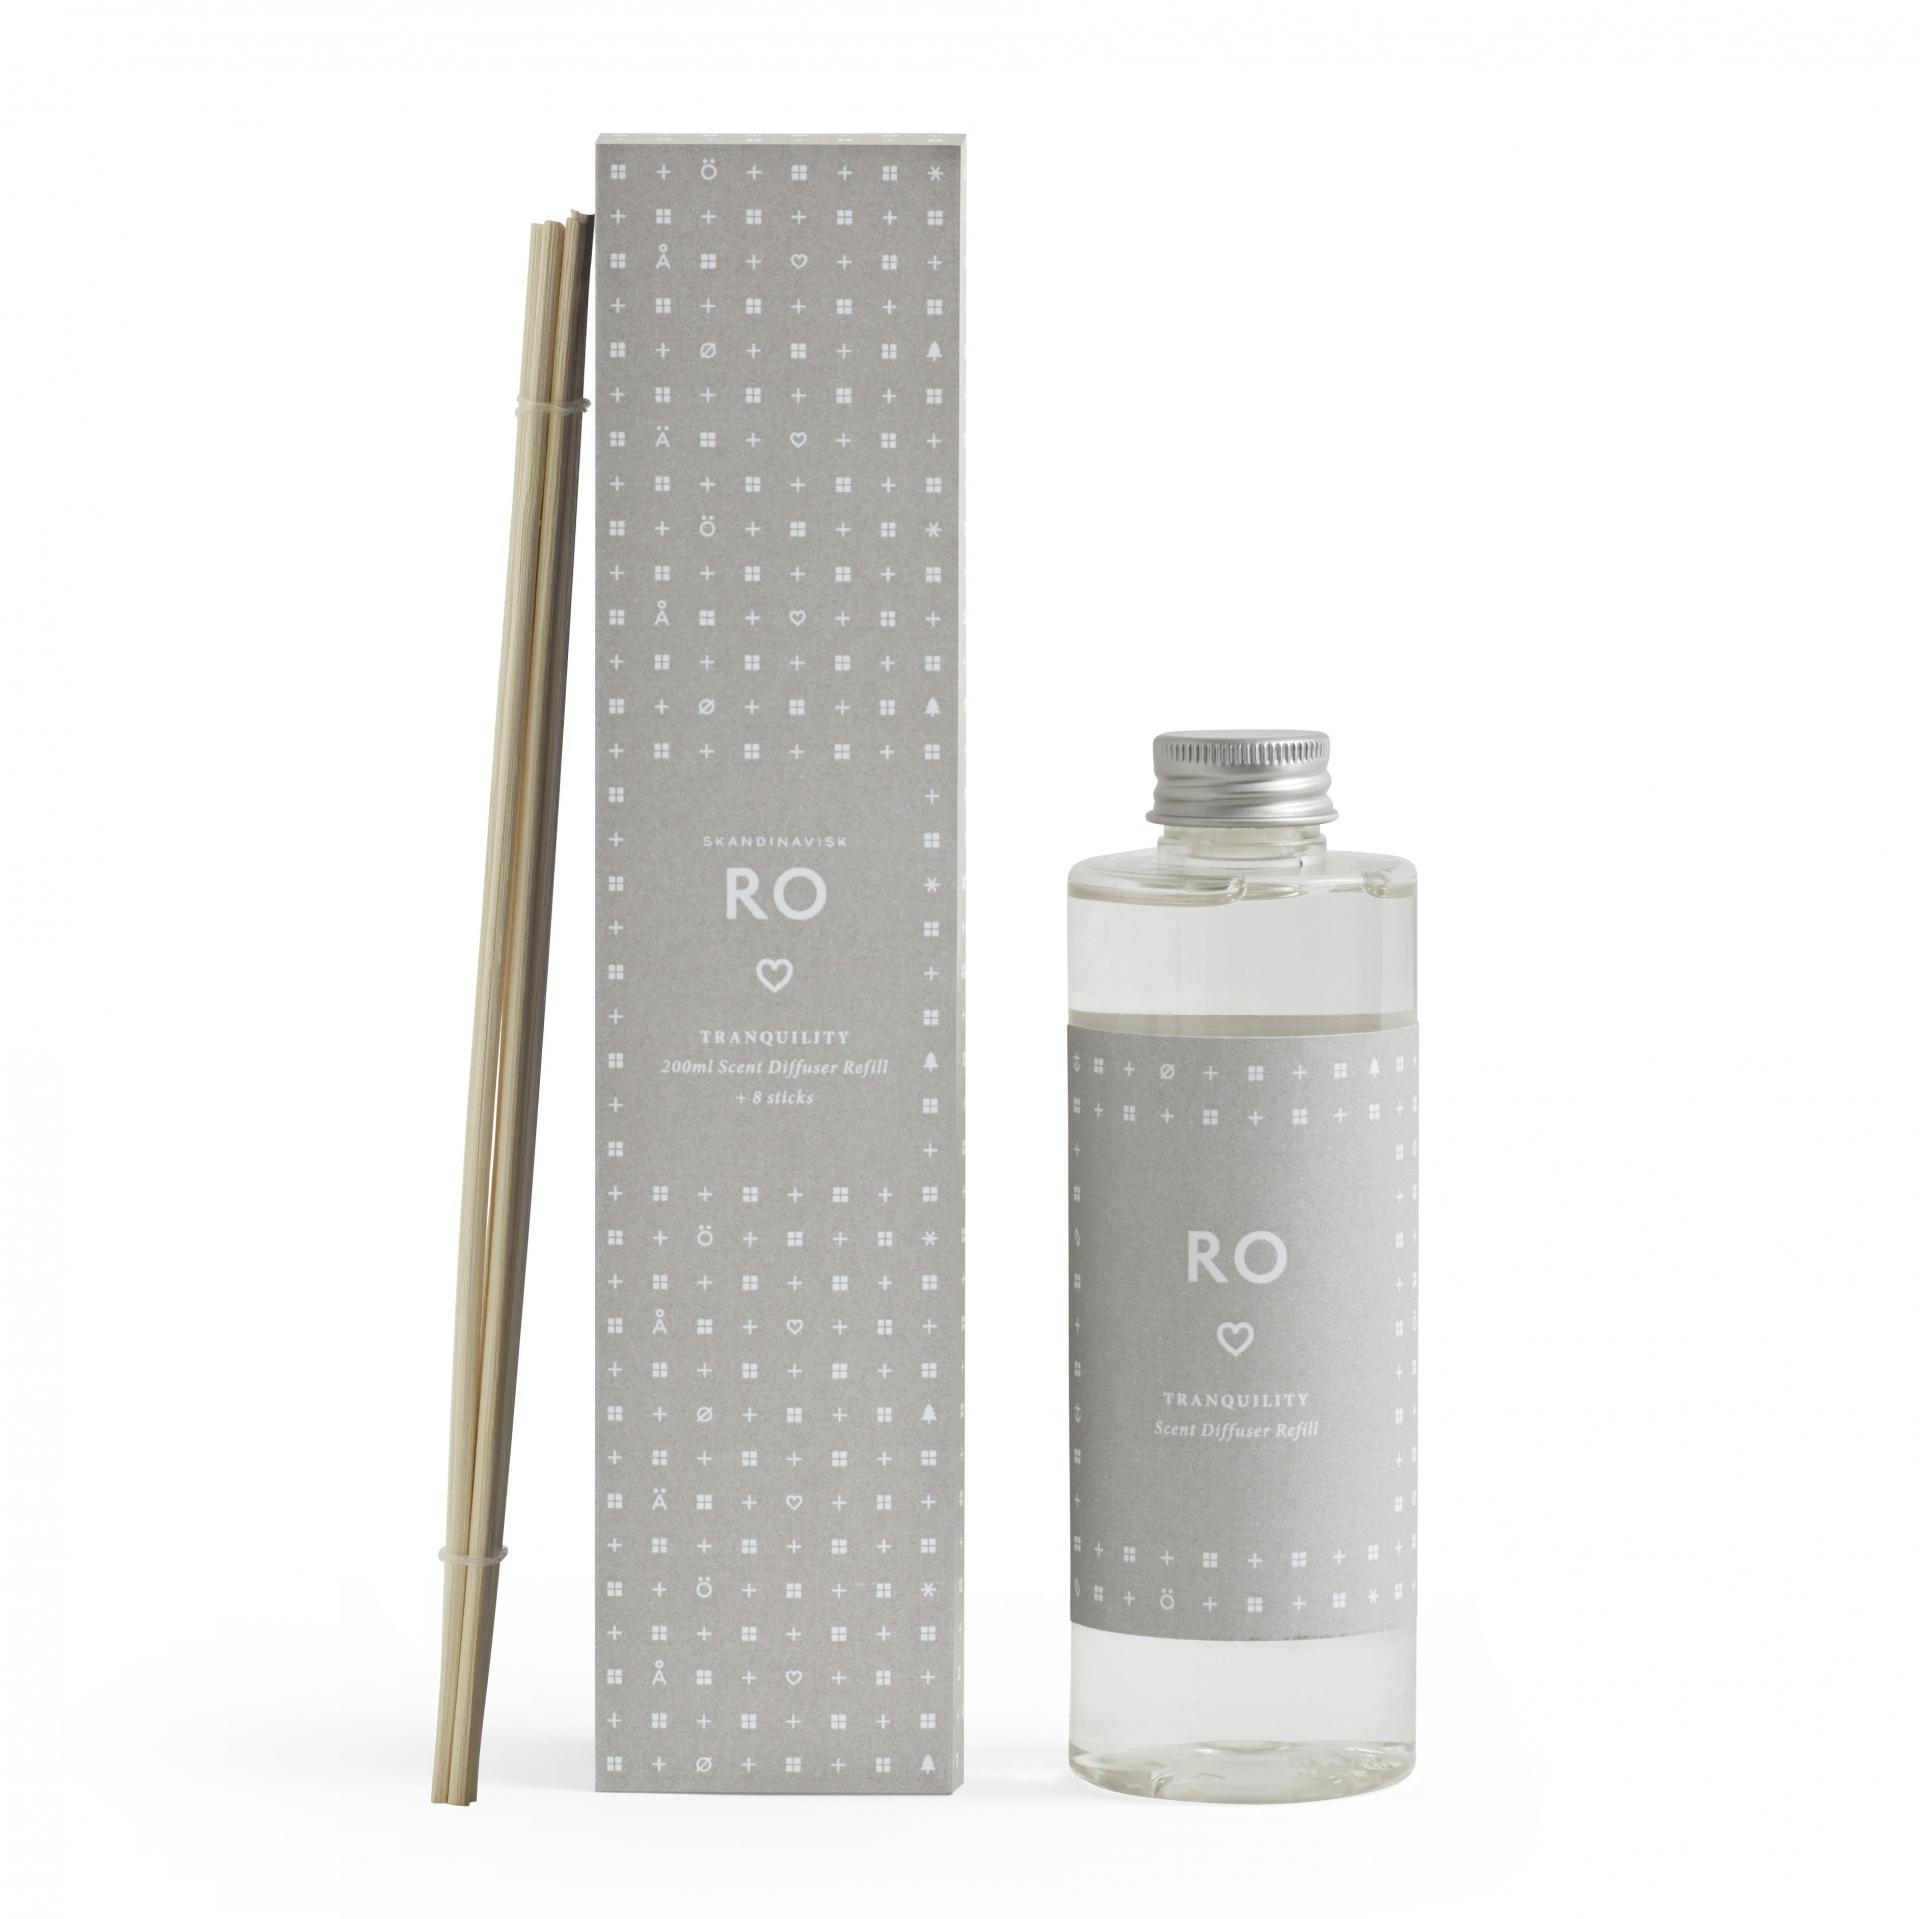 SKANDINAVISK Náhradní náplň do difuzéru RO (klid) 200 ml, béžová barva, plast